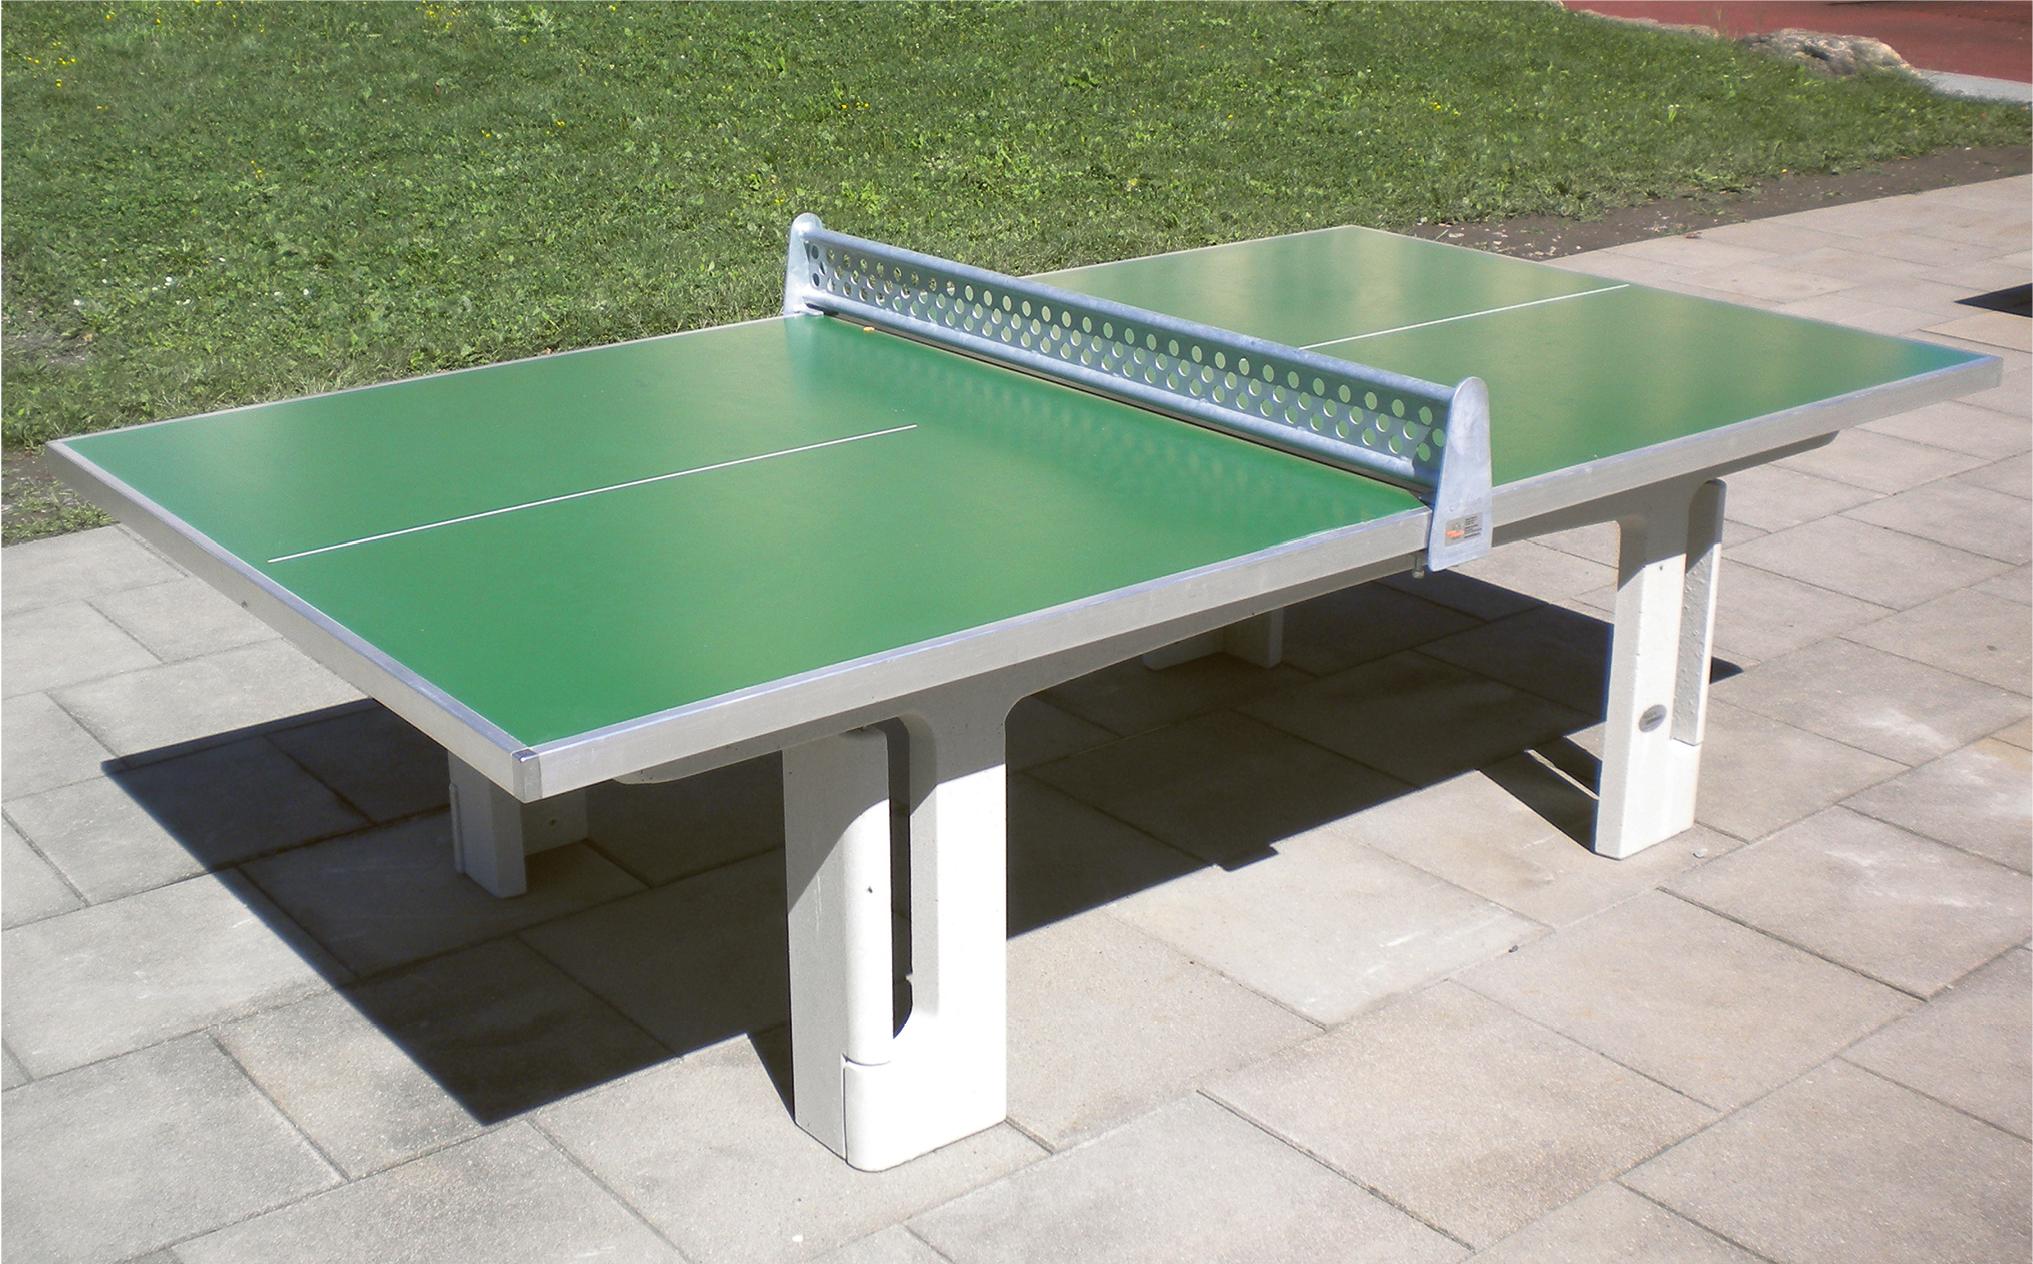 tables de ping pong fuchs thun. Black Bedroom Furniture Sets. Home Design Ideas